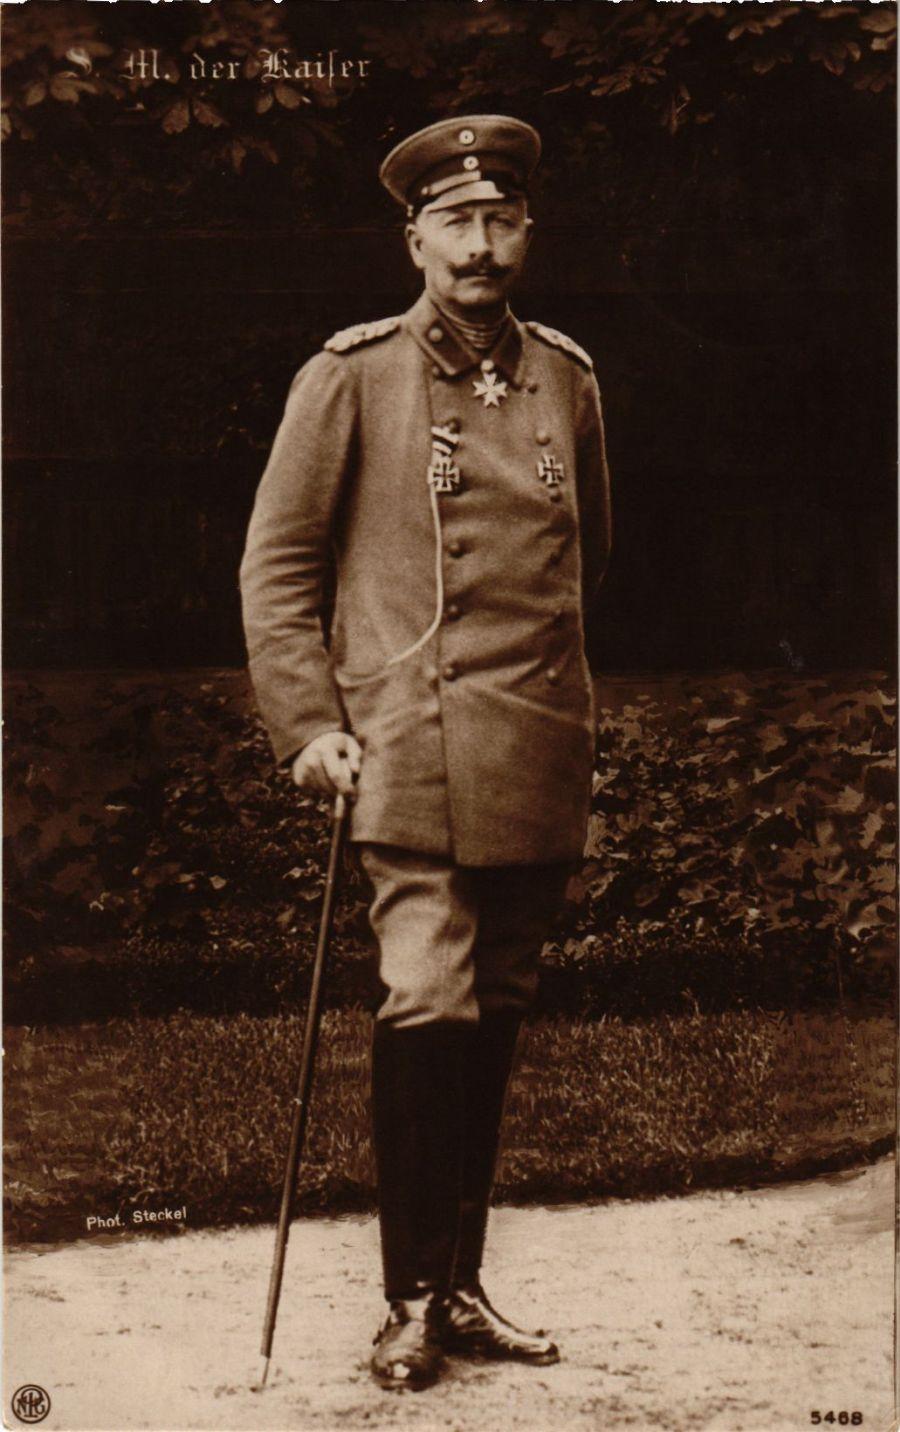 CPA-AK-Kaiser-Wilhelm-II-GERMAN-ROYALTY-867502